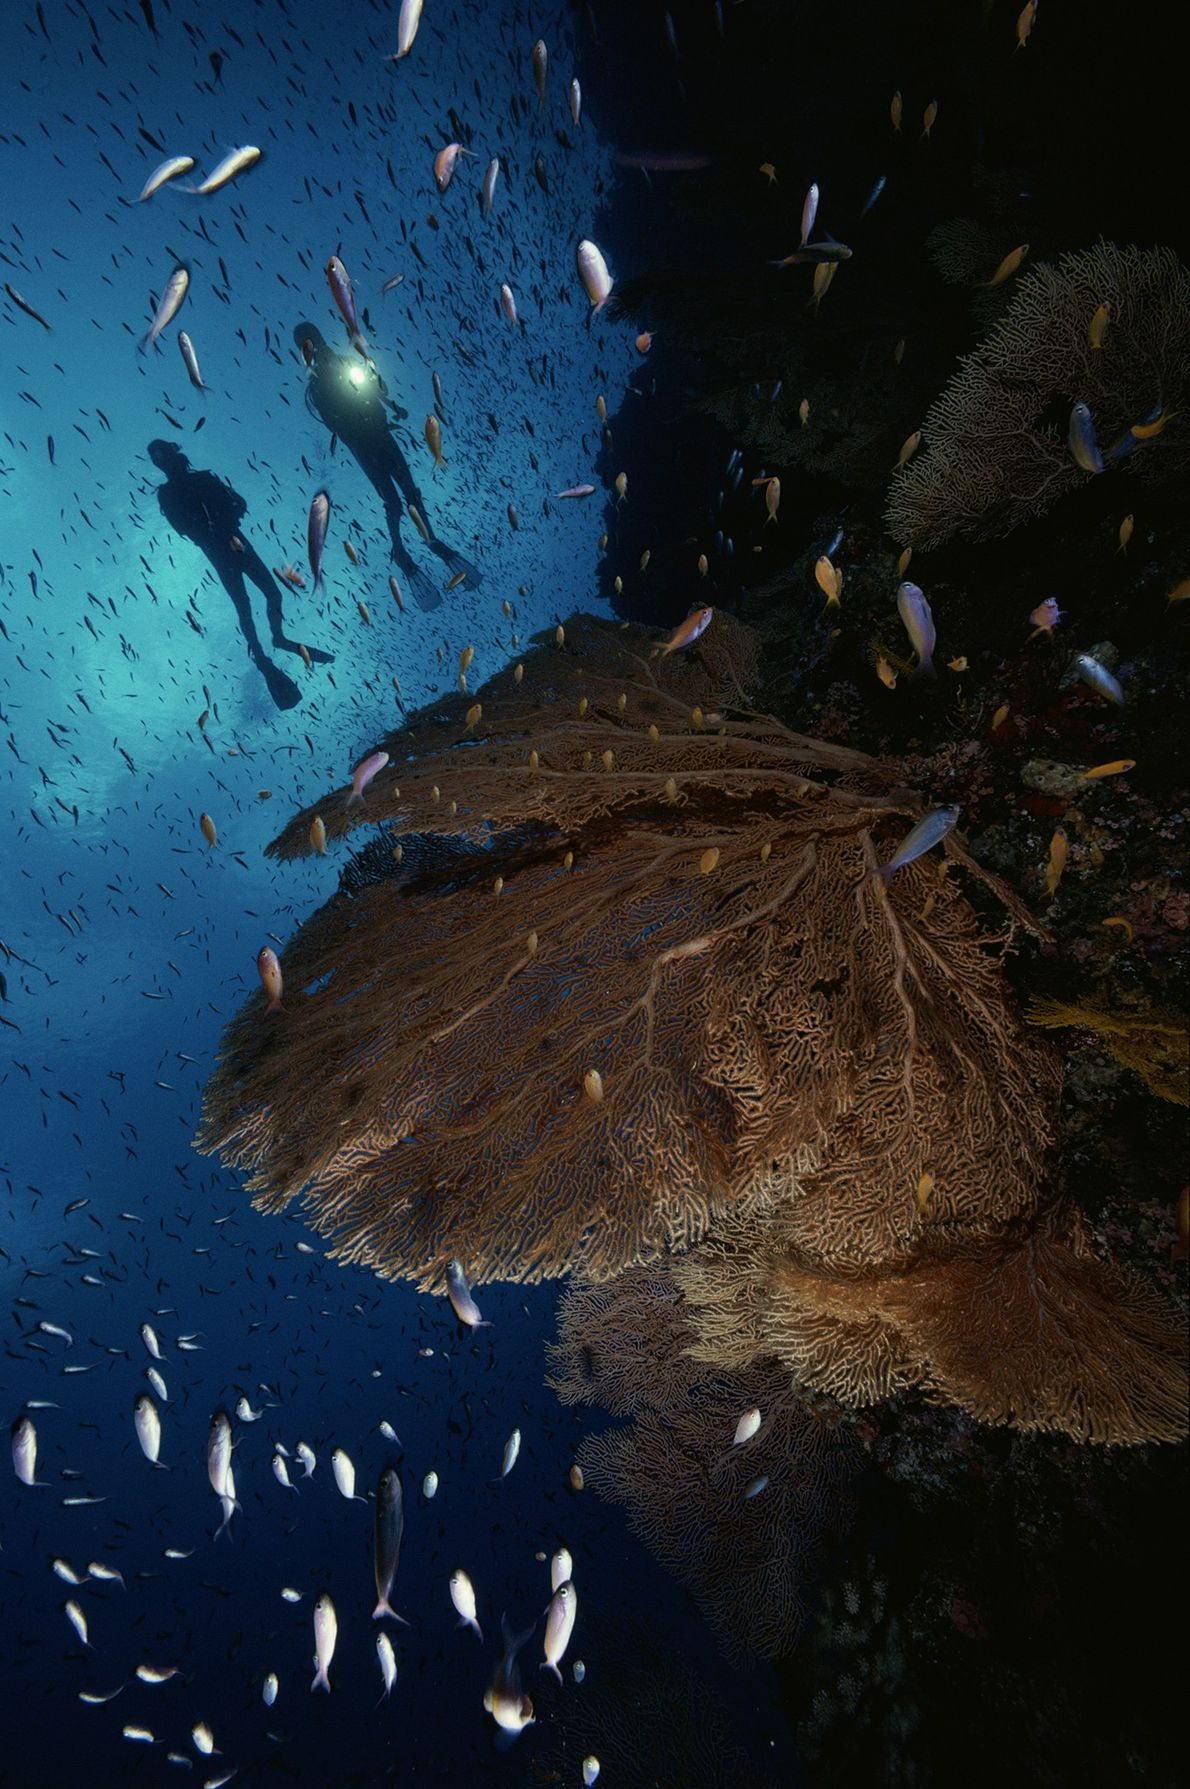 Pared de arrecife